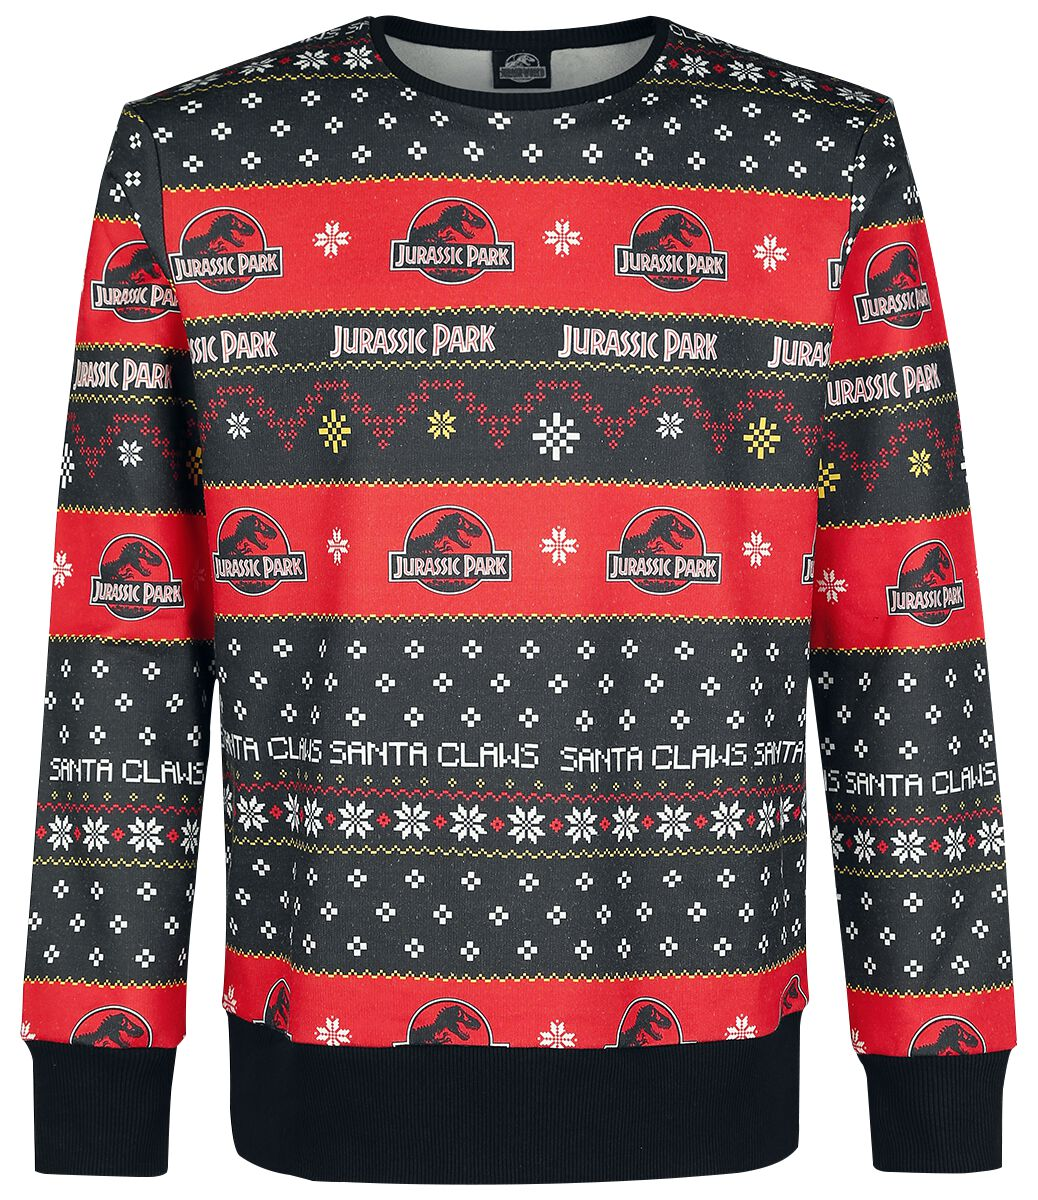 Christmas Sweater   Jurassic Park Weihnachtspullover   EMP